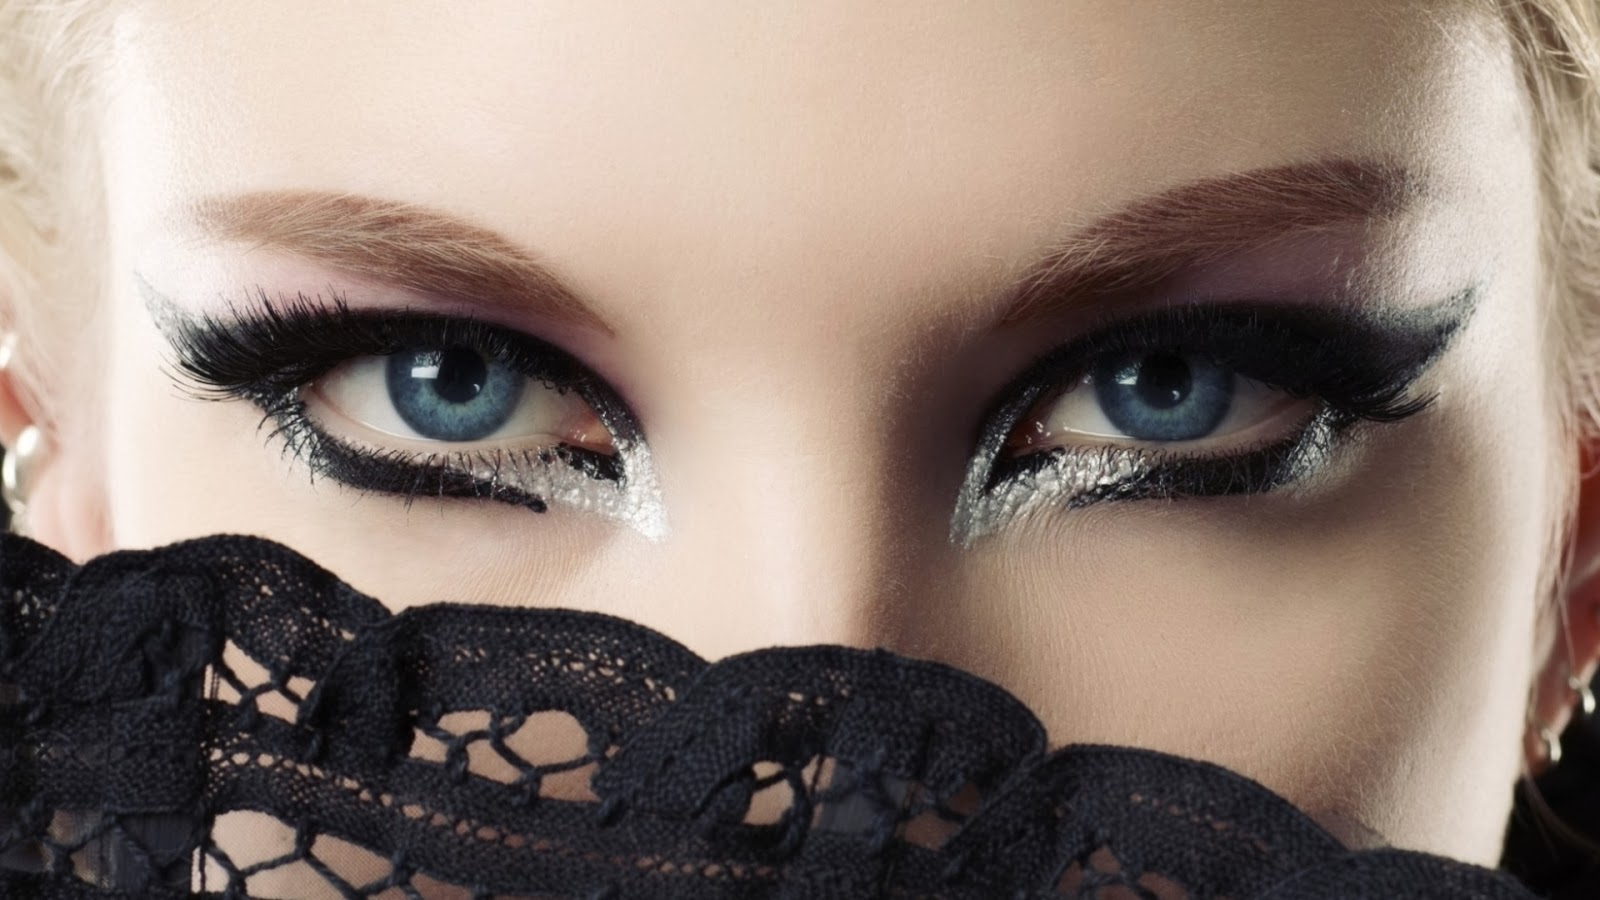 Hd Wallpapers Of Nail Art Hot Girl Wallpaper Beautiful Eyes Hd Wallpaper Free